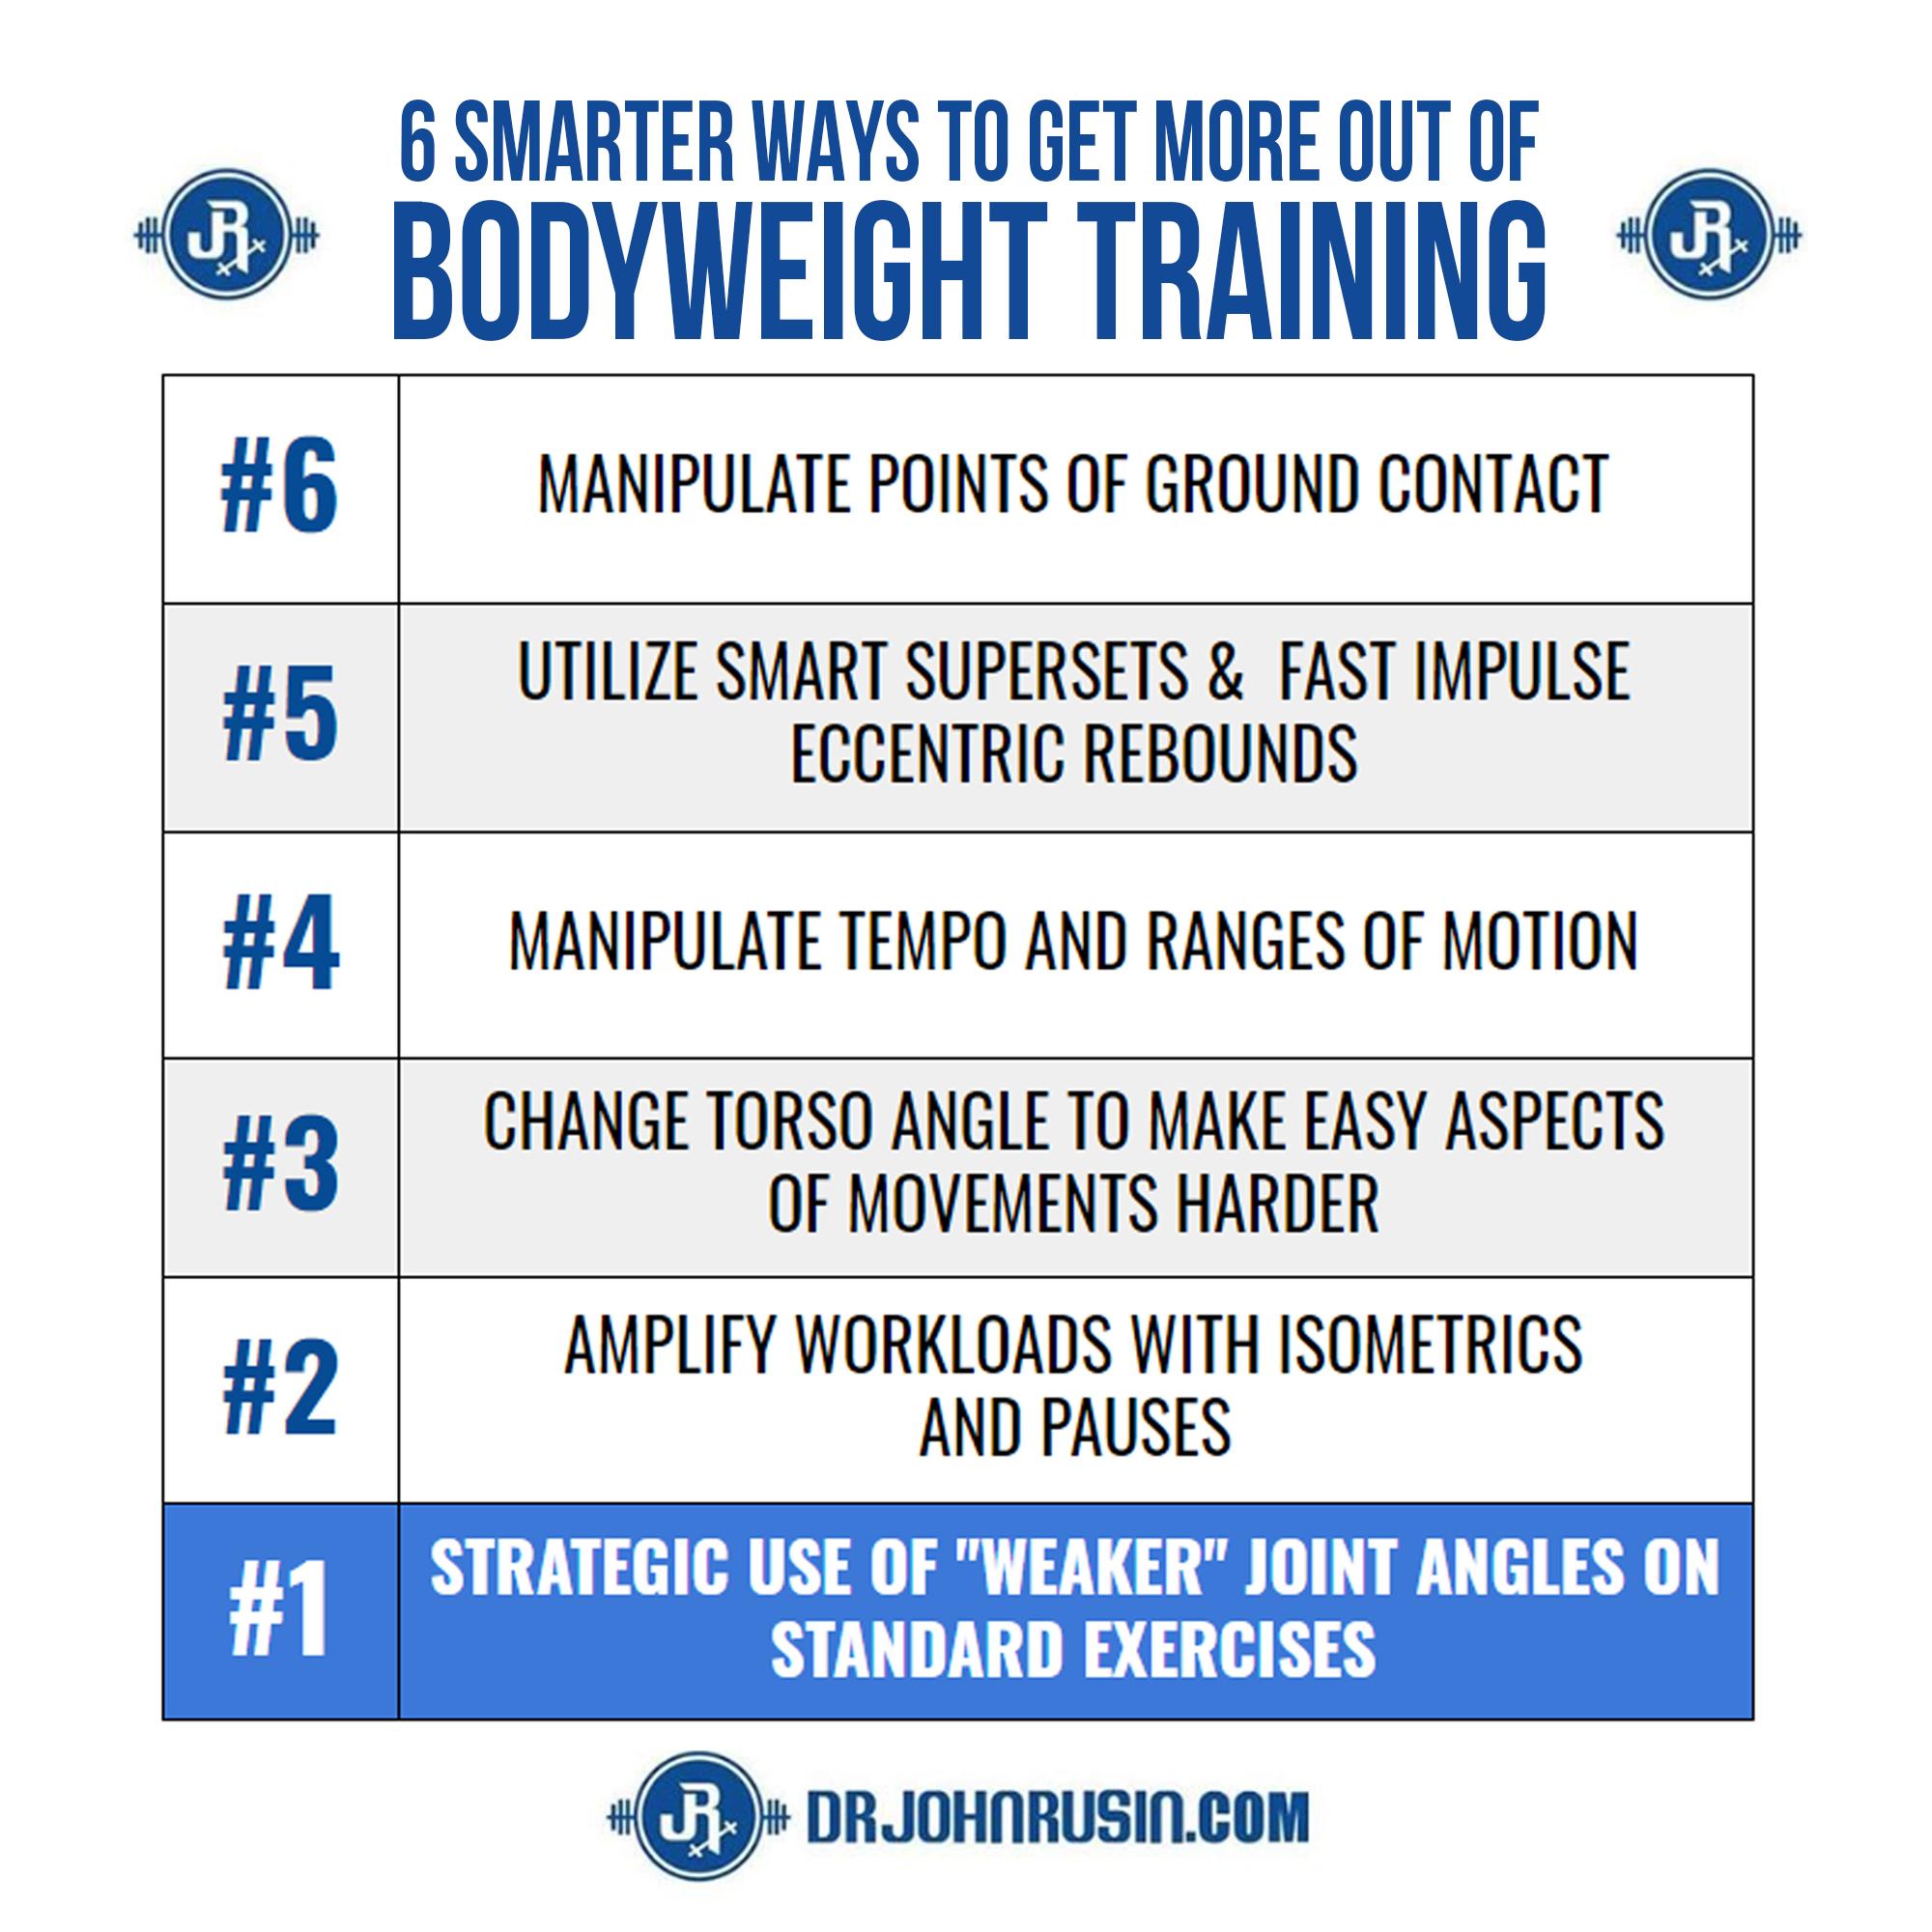 formation de poids corporel